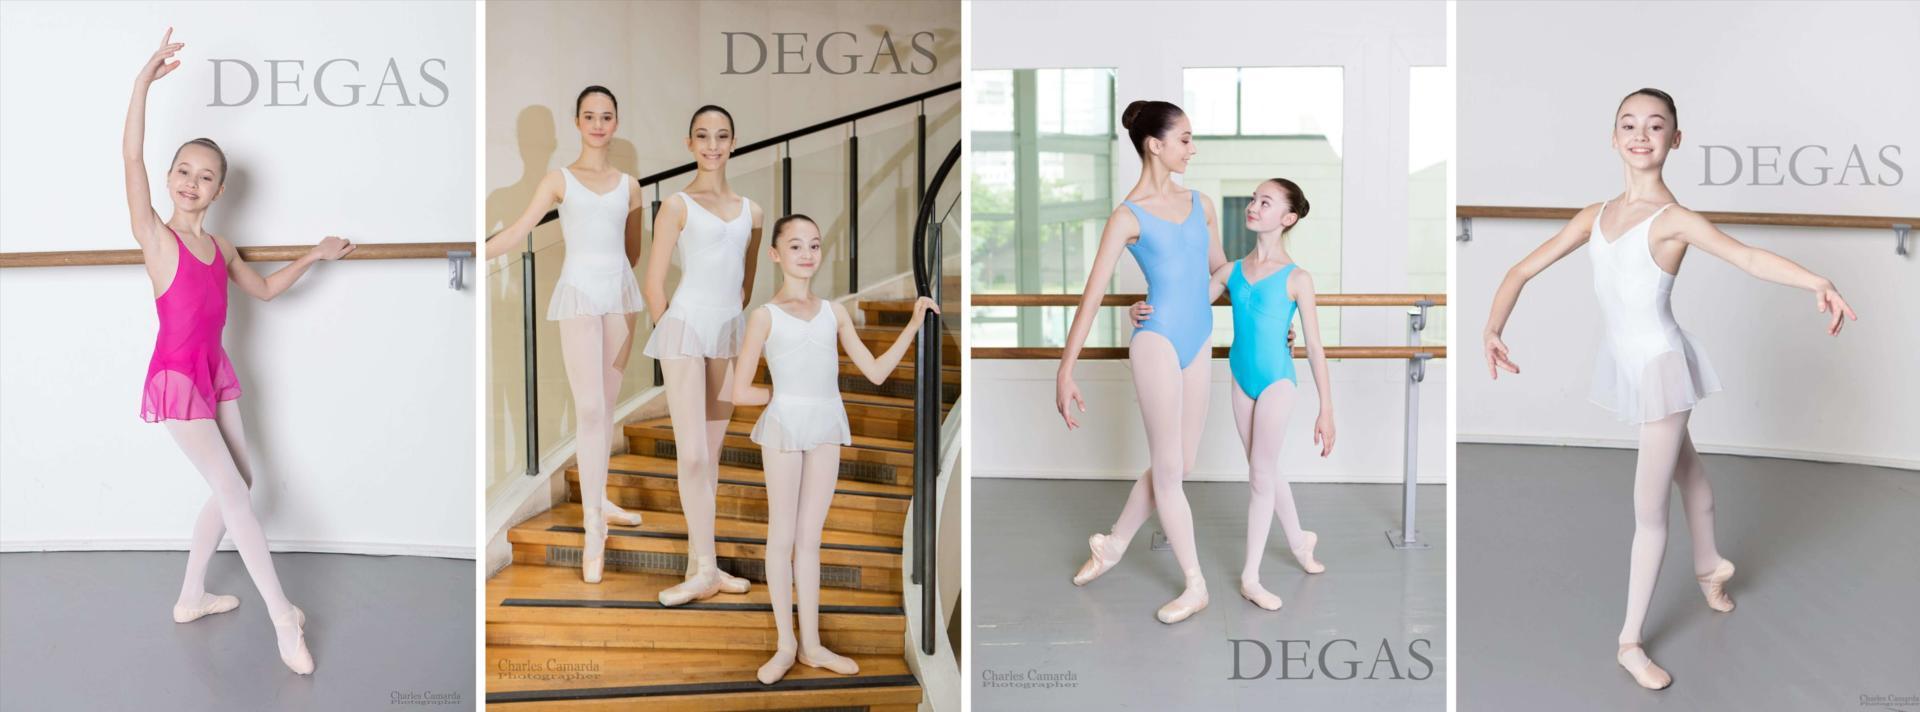 Tenues Degas Ecoles de danse